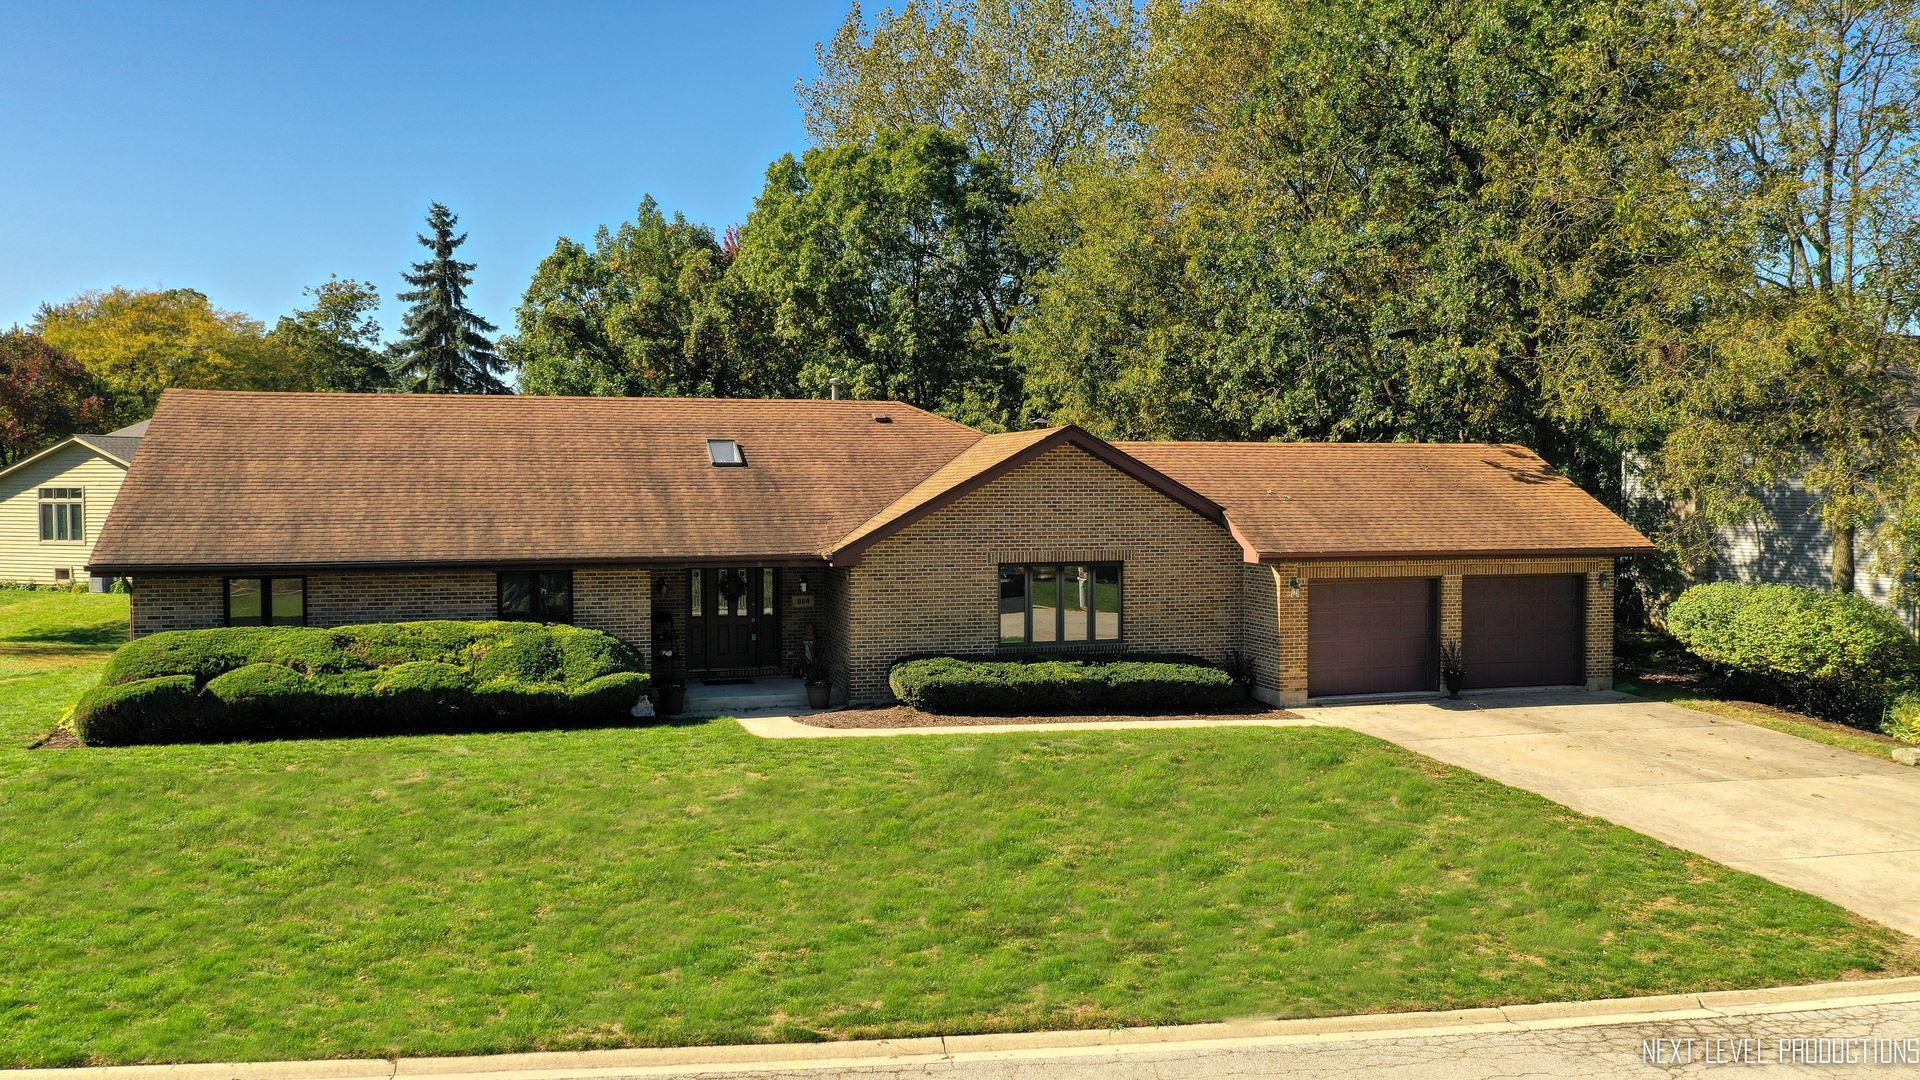 Photo of 884 Bonnie Brae Lane, Bolingbrook, IL 60440 (MLS # 10894494)